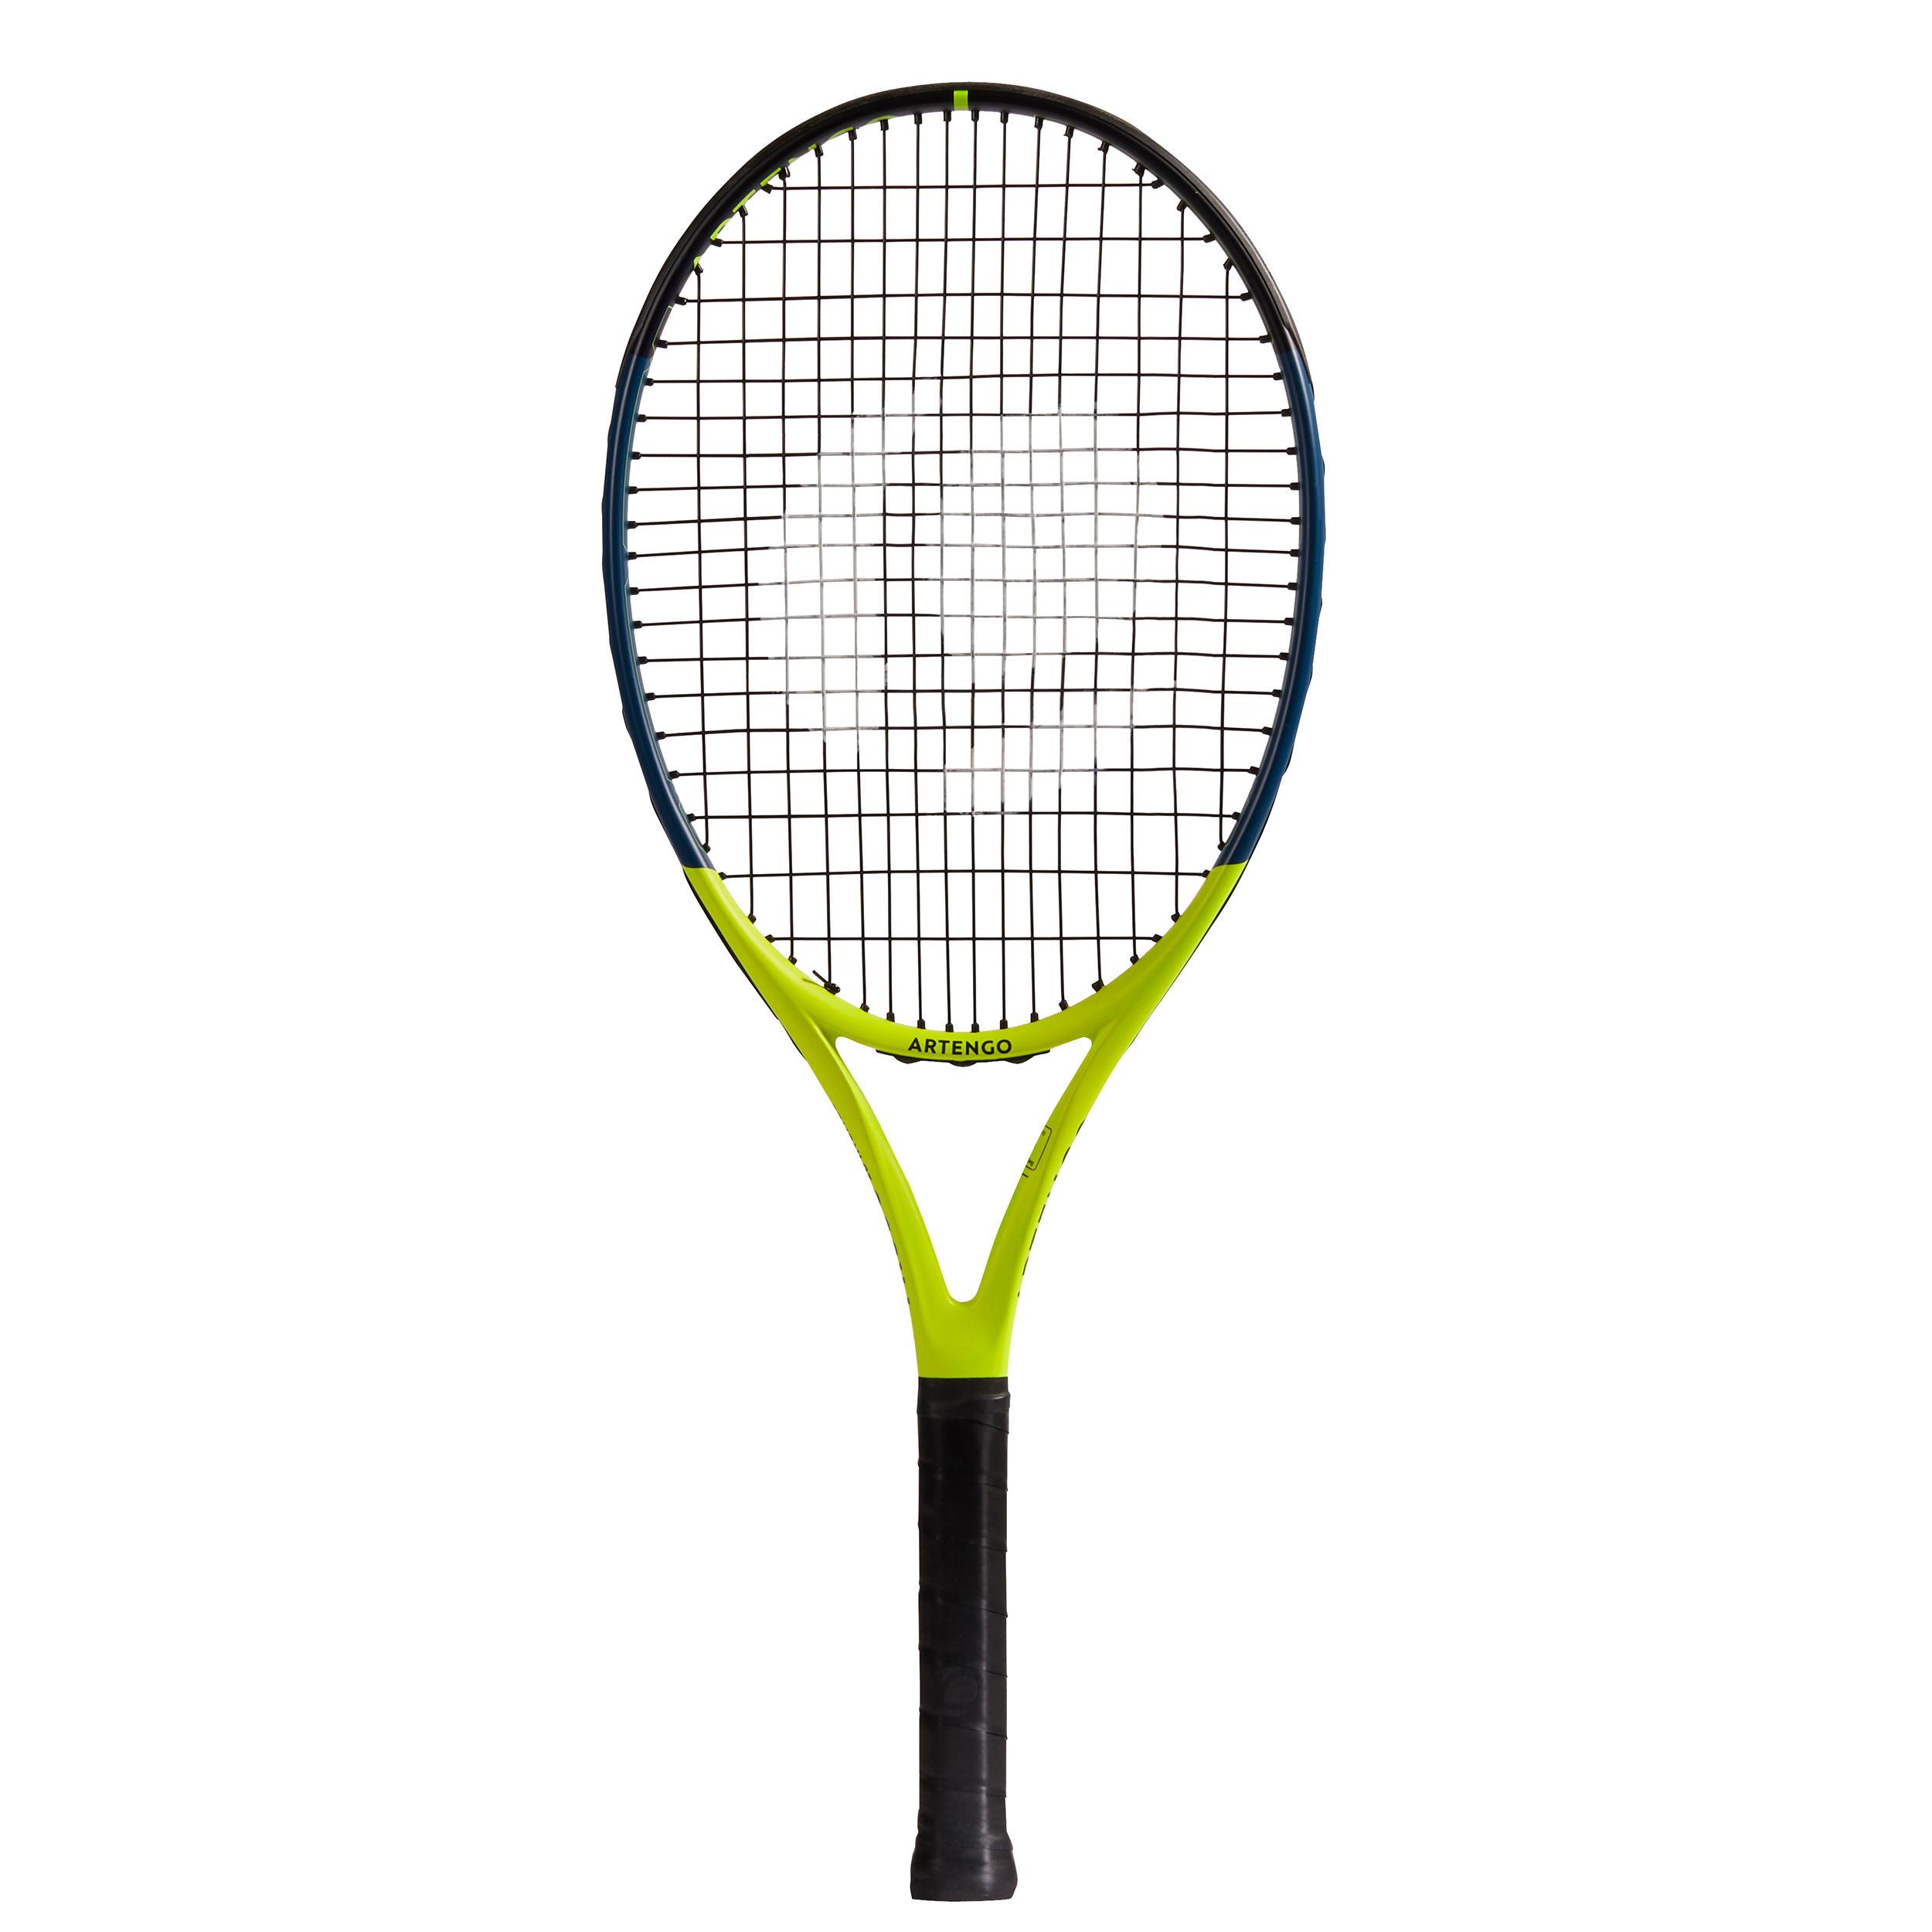 Rachetă Tenis TR530 M26 Copii